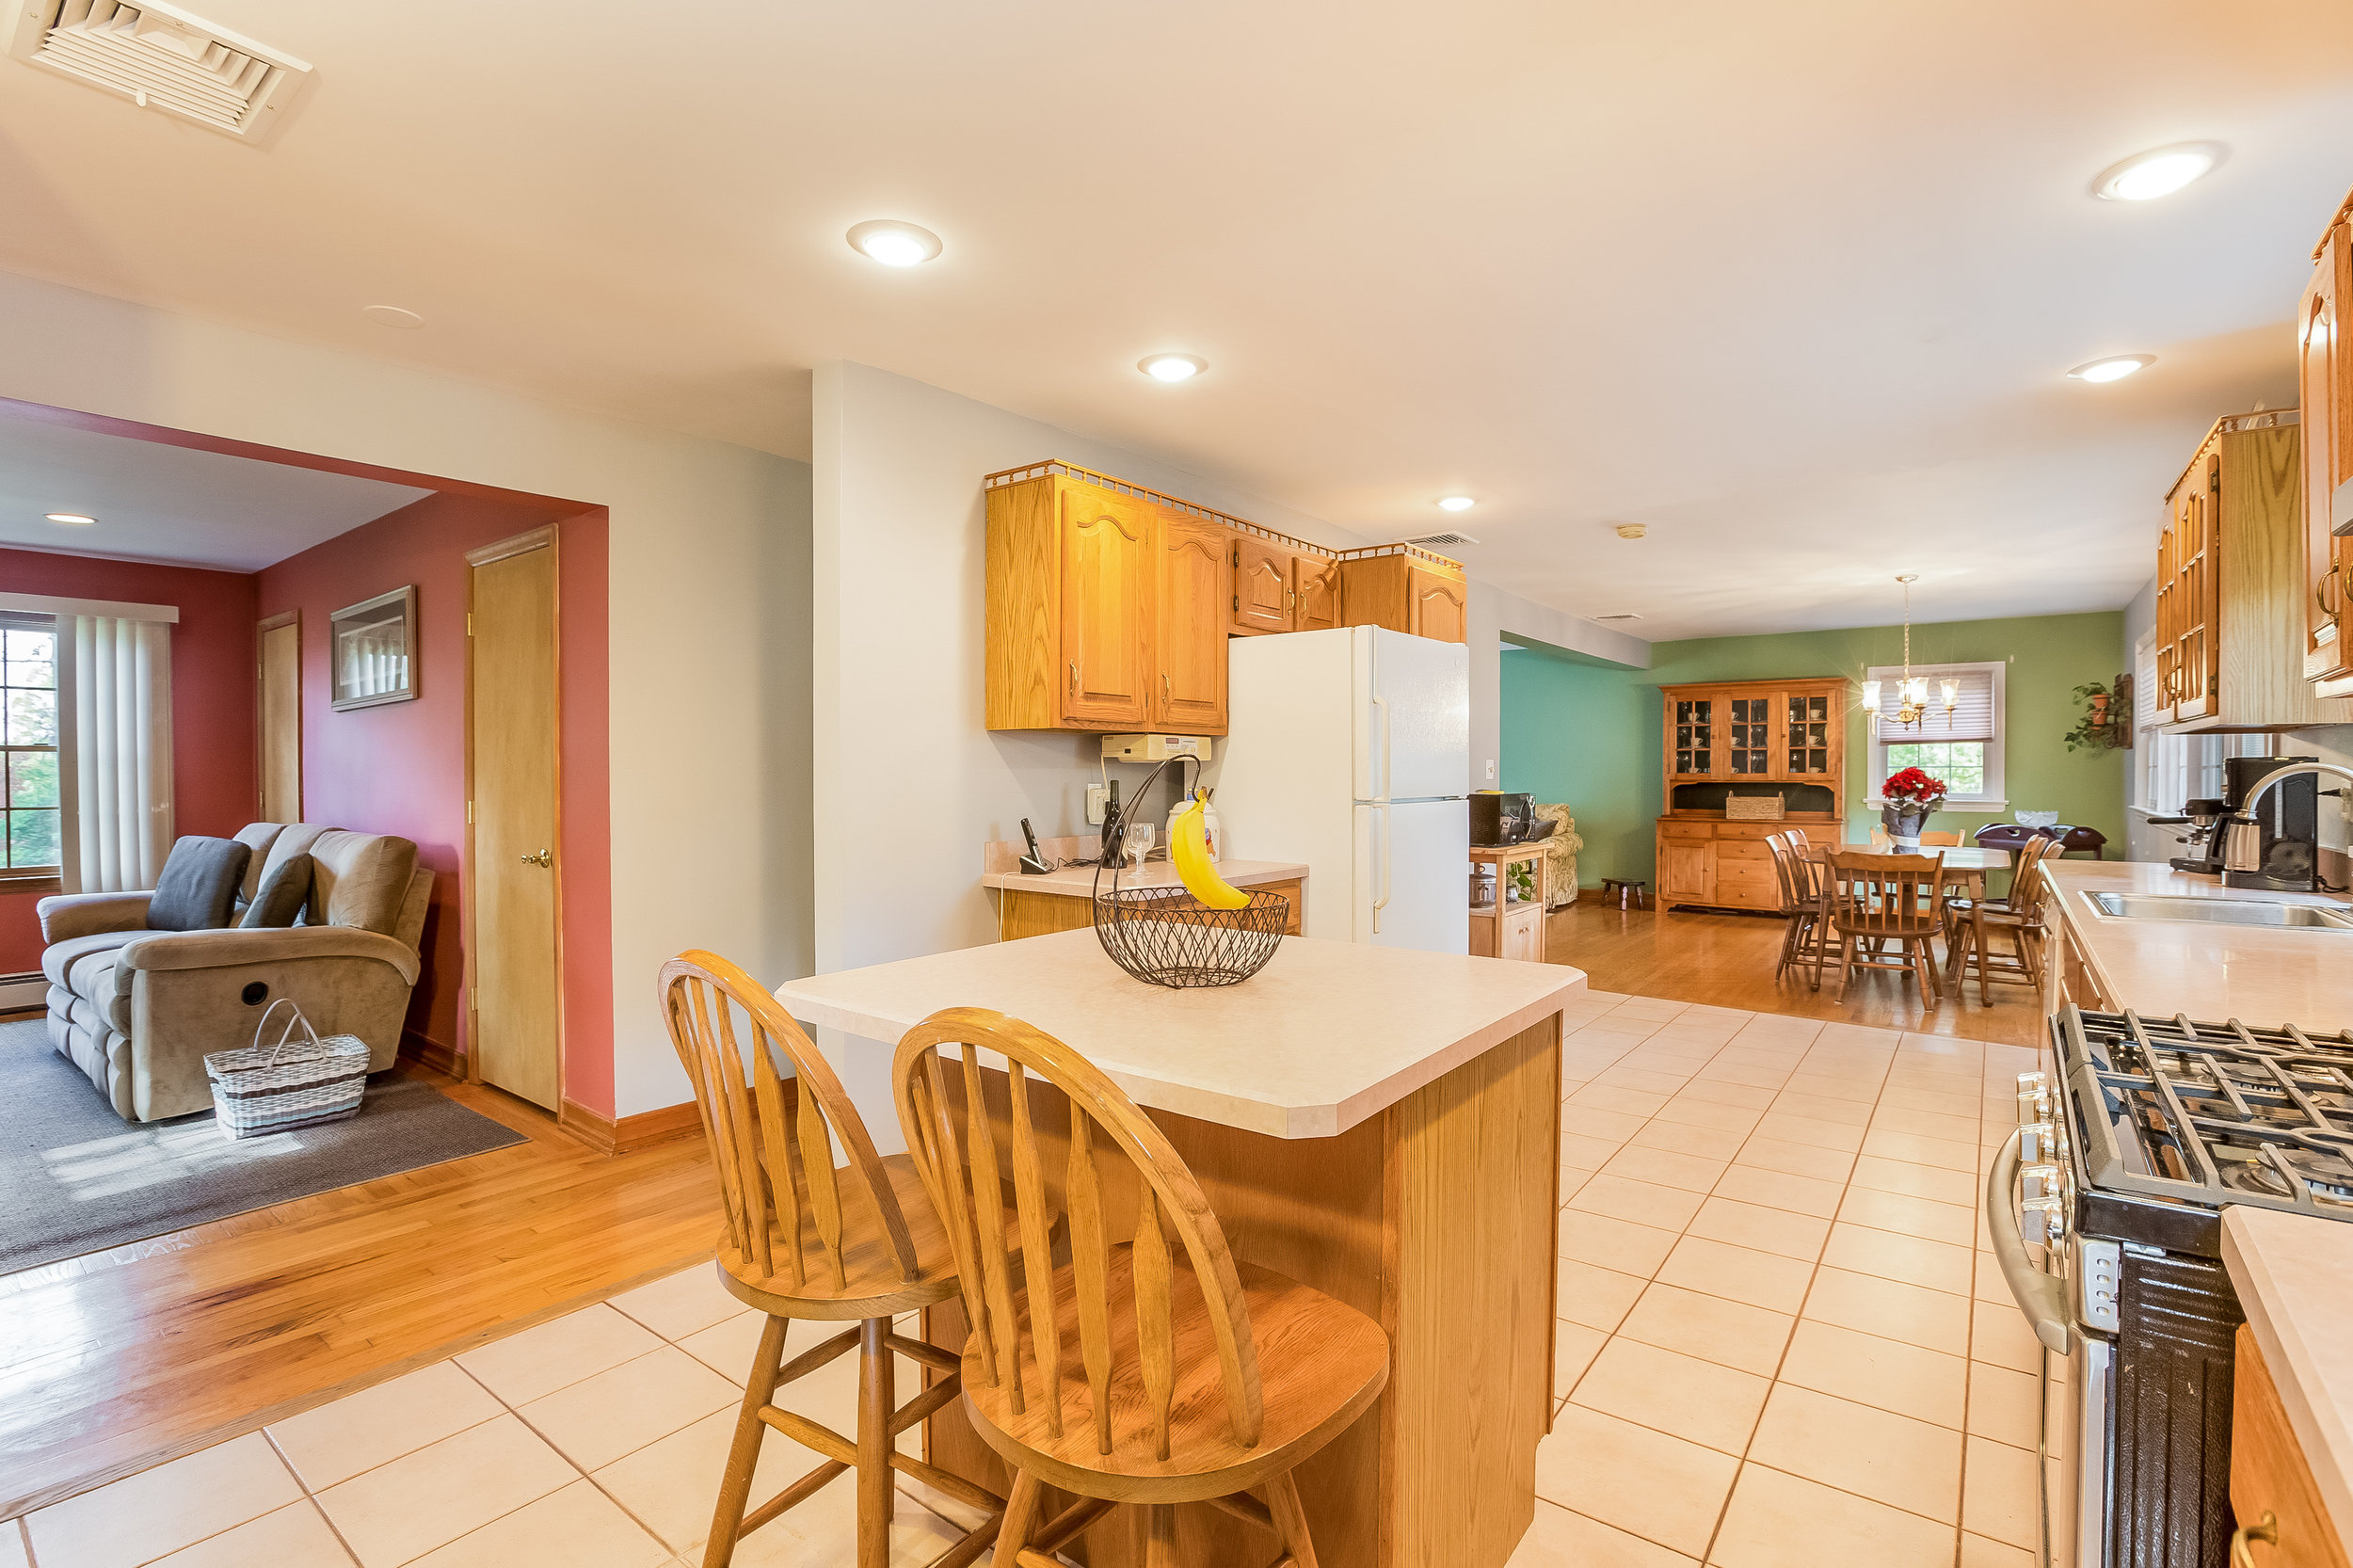 020-Kitchen-5002155-large.jpg